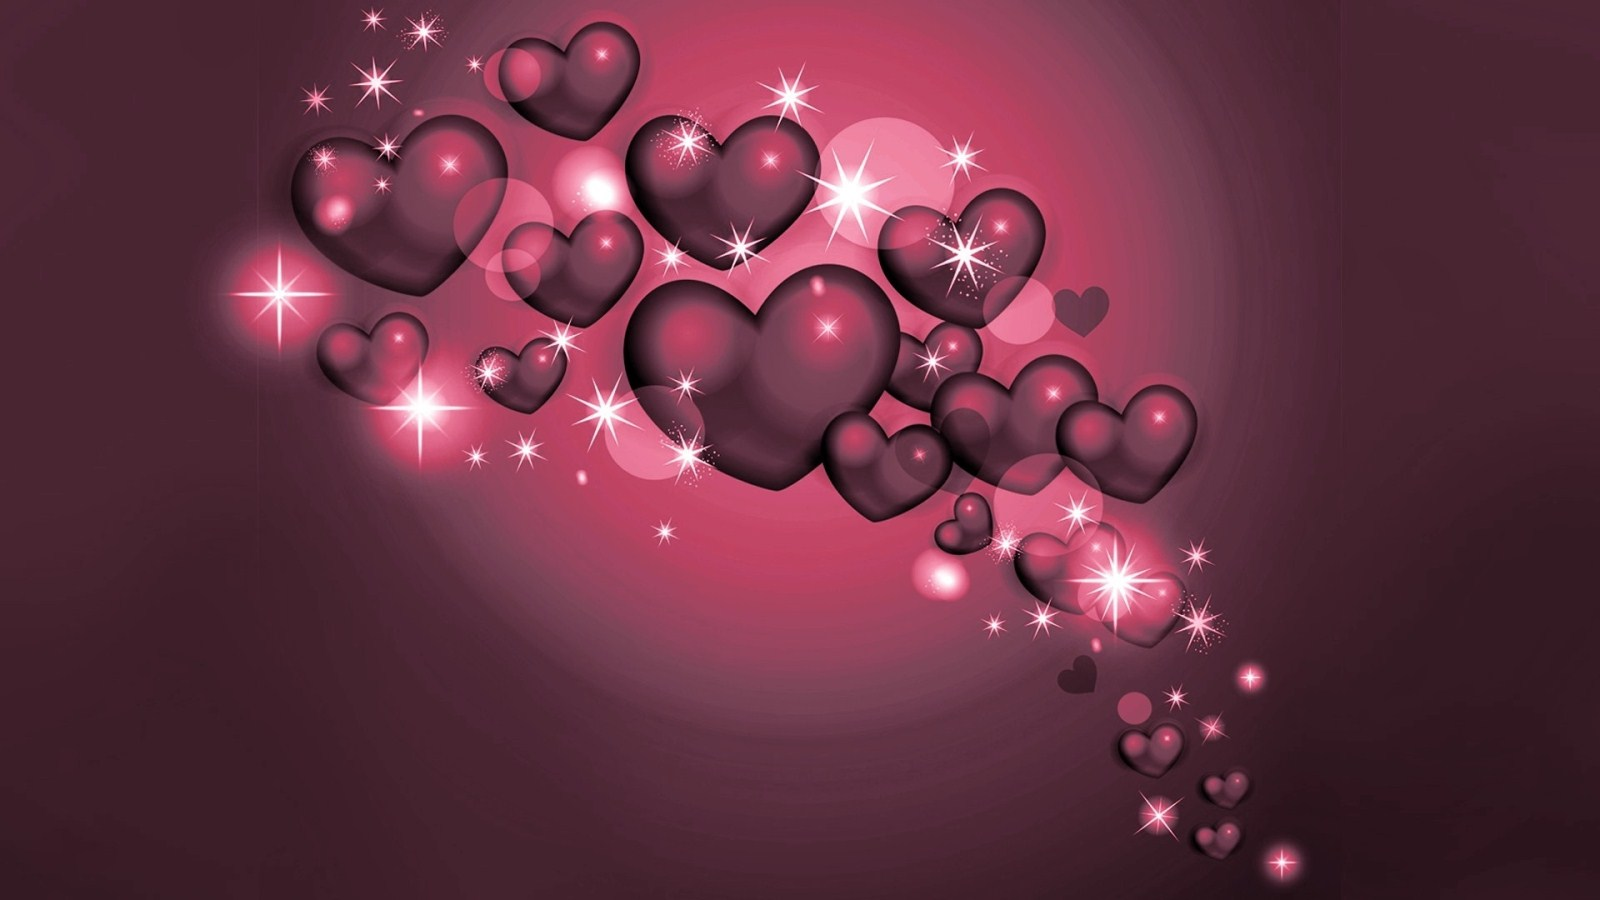 Friends4allu - The True Friendship Site: Love Heart Wallpapers ...